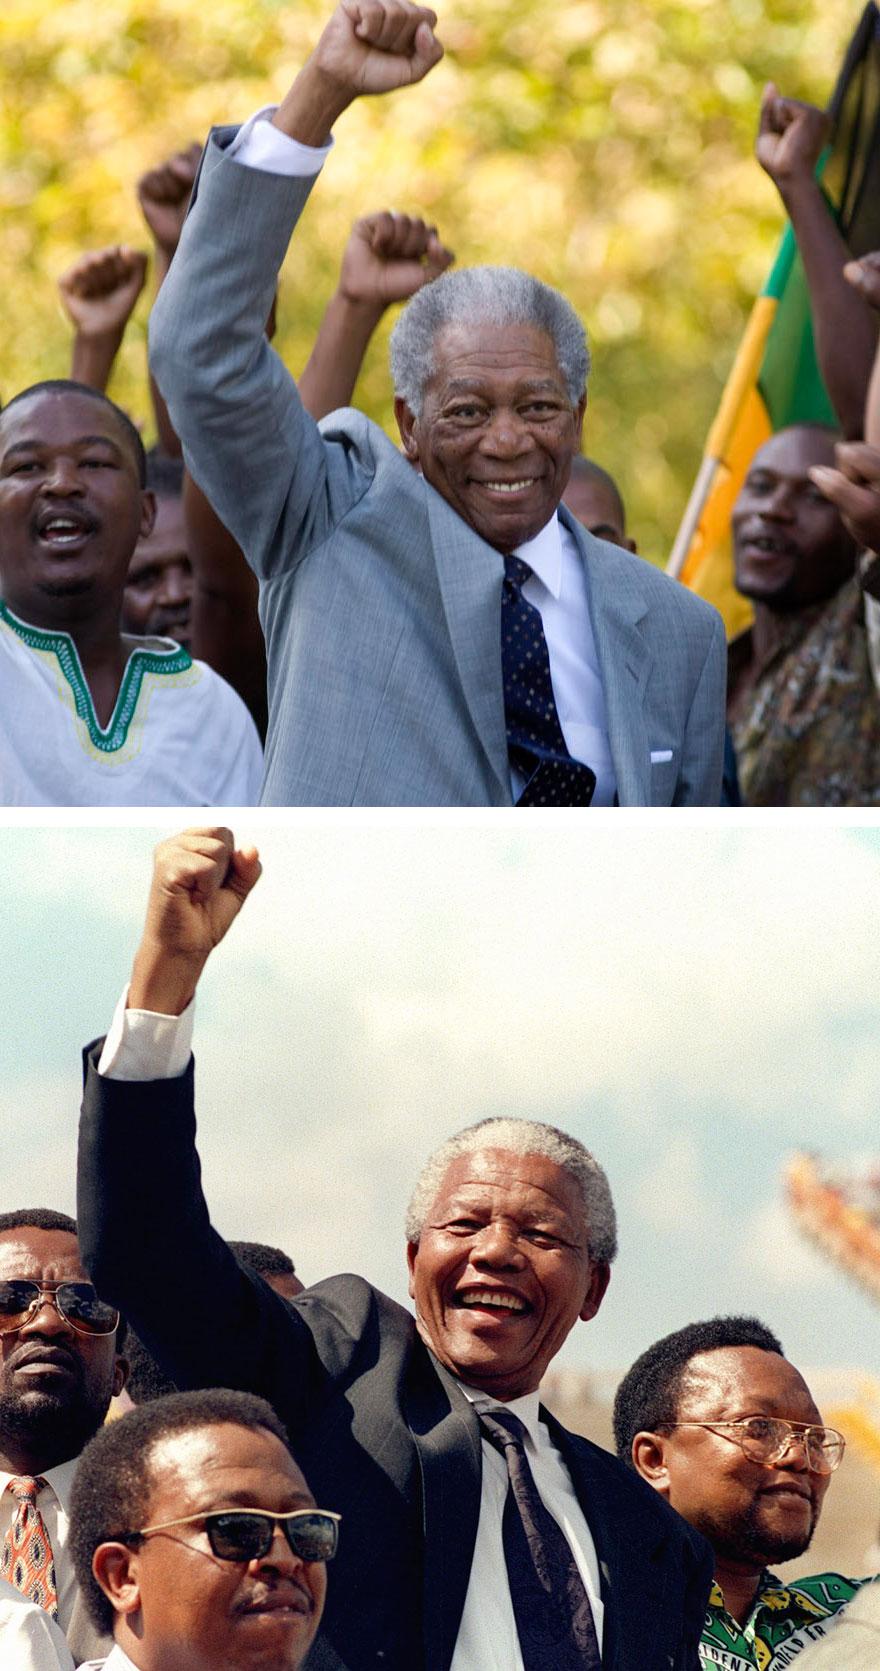 Morgan Freeman As Nelson Mandela In Invictus (2009)